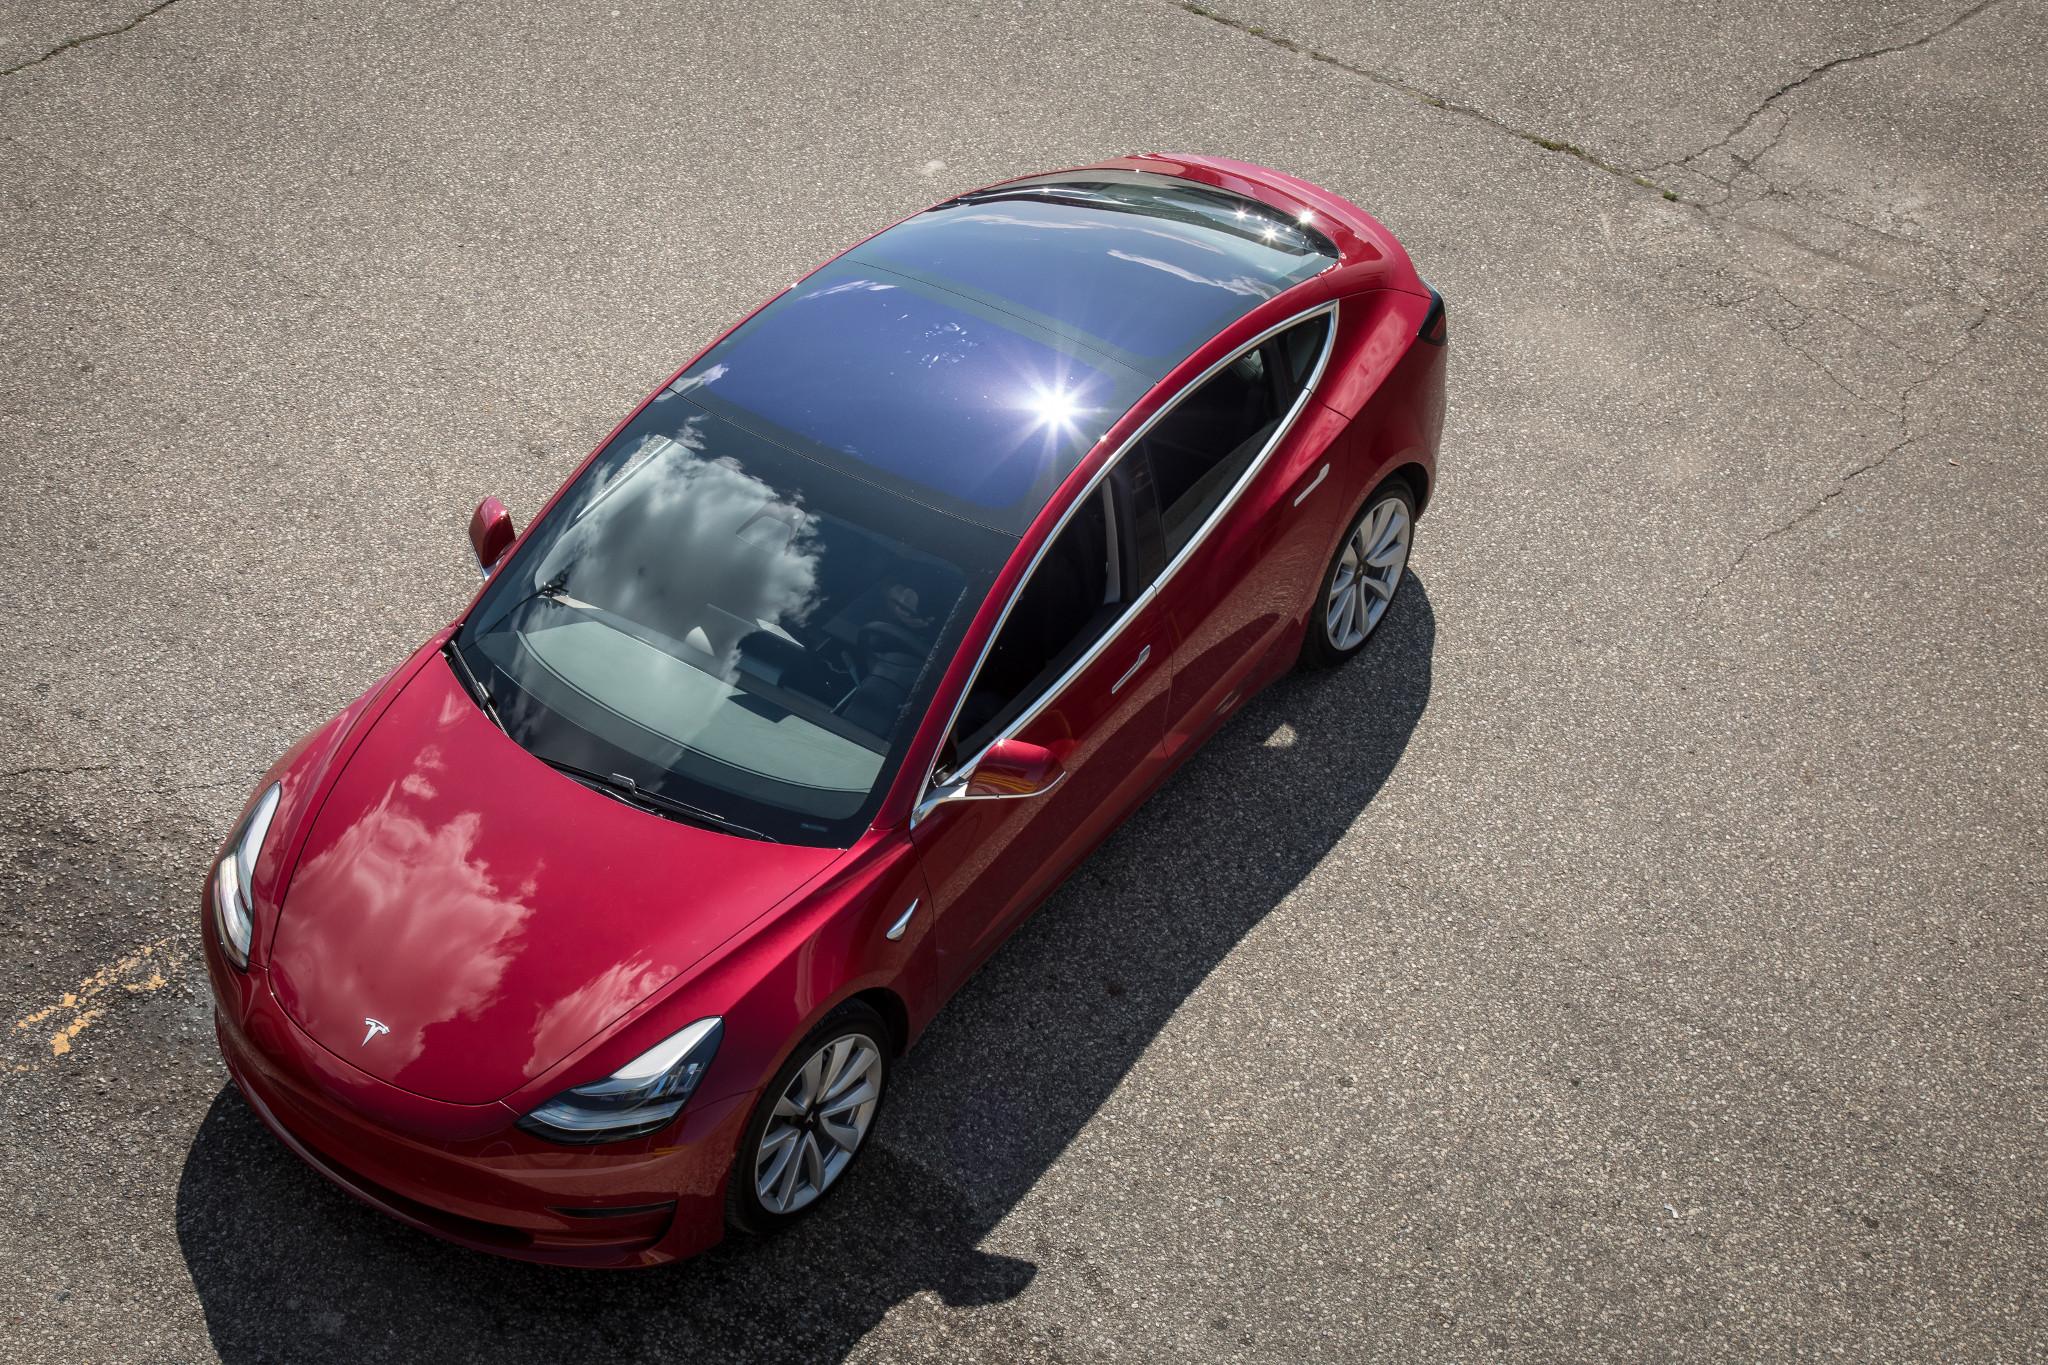 How Do Car Seats Fit in a 2019 Tesla Model 3? via @carsdotcom